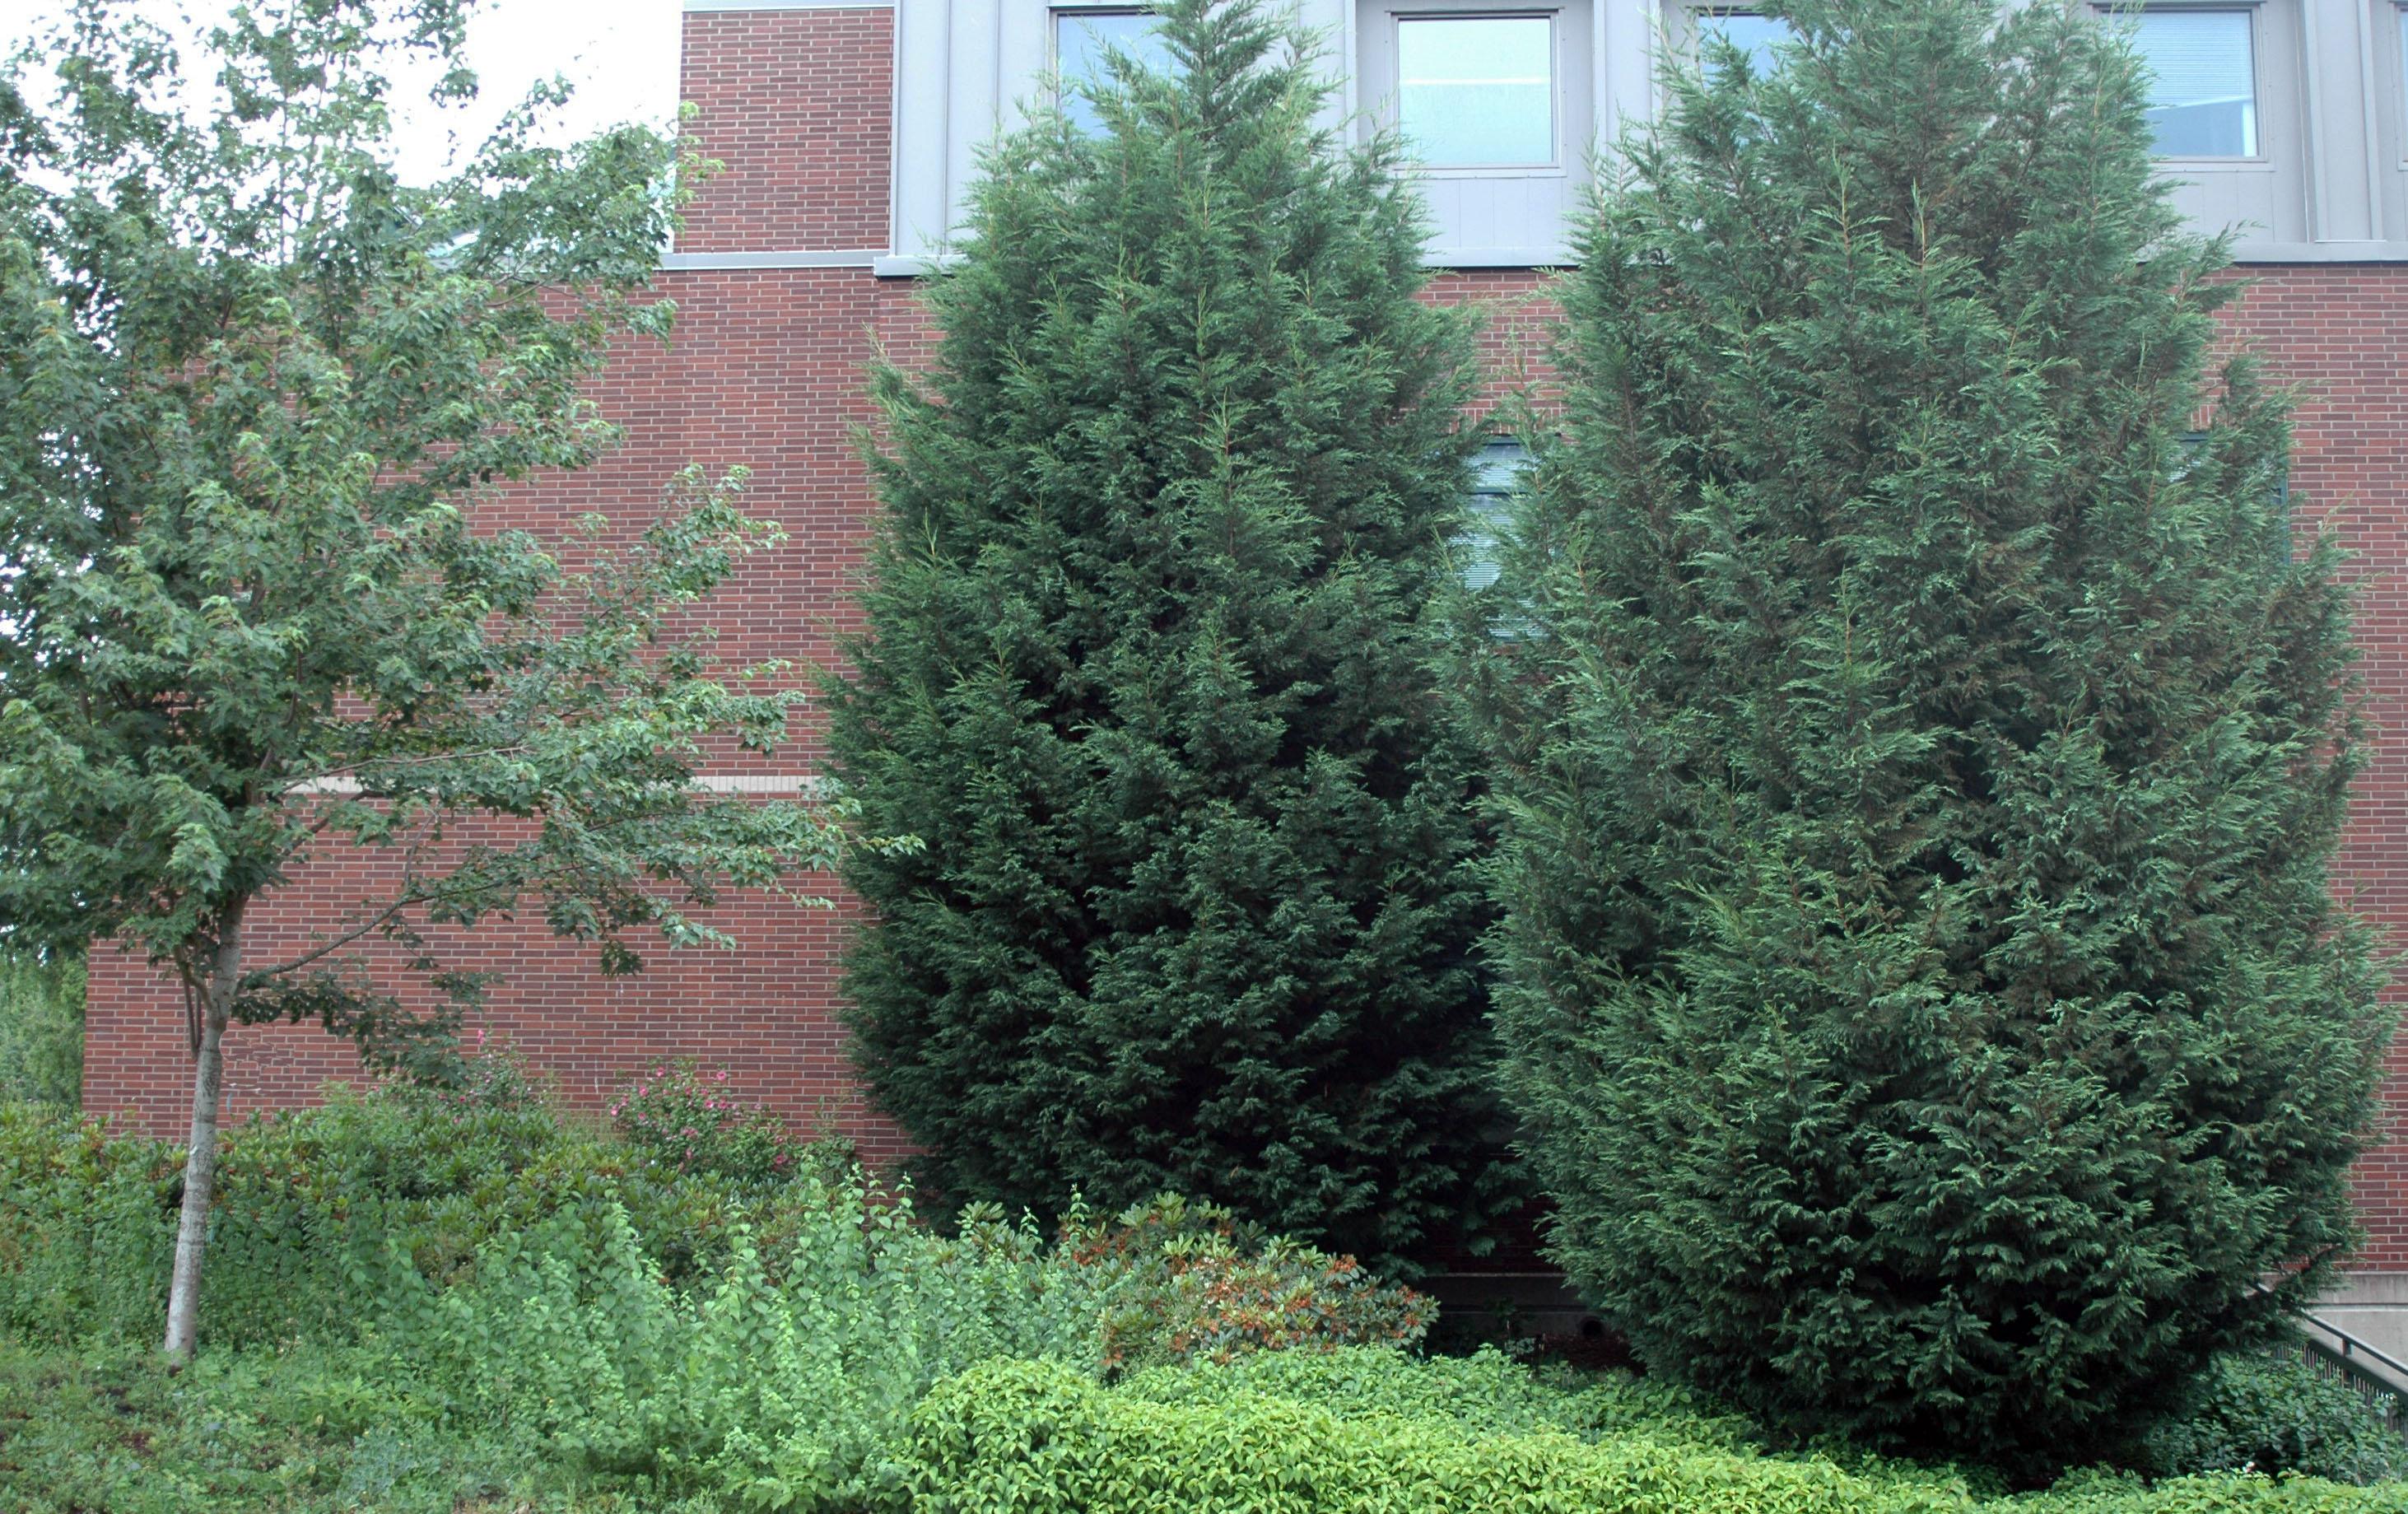 Cuprocyparis Leylandii Emerald Isle Landscape Plants Oregon State University